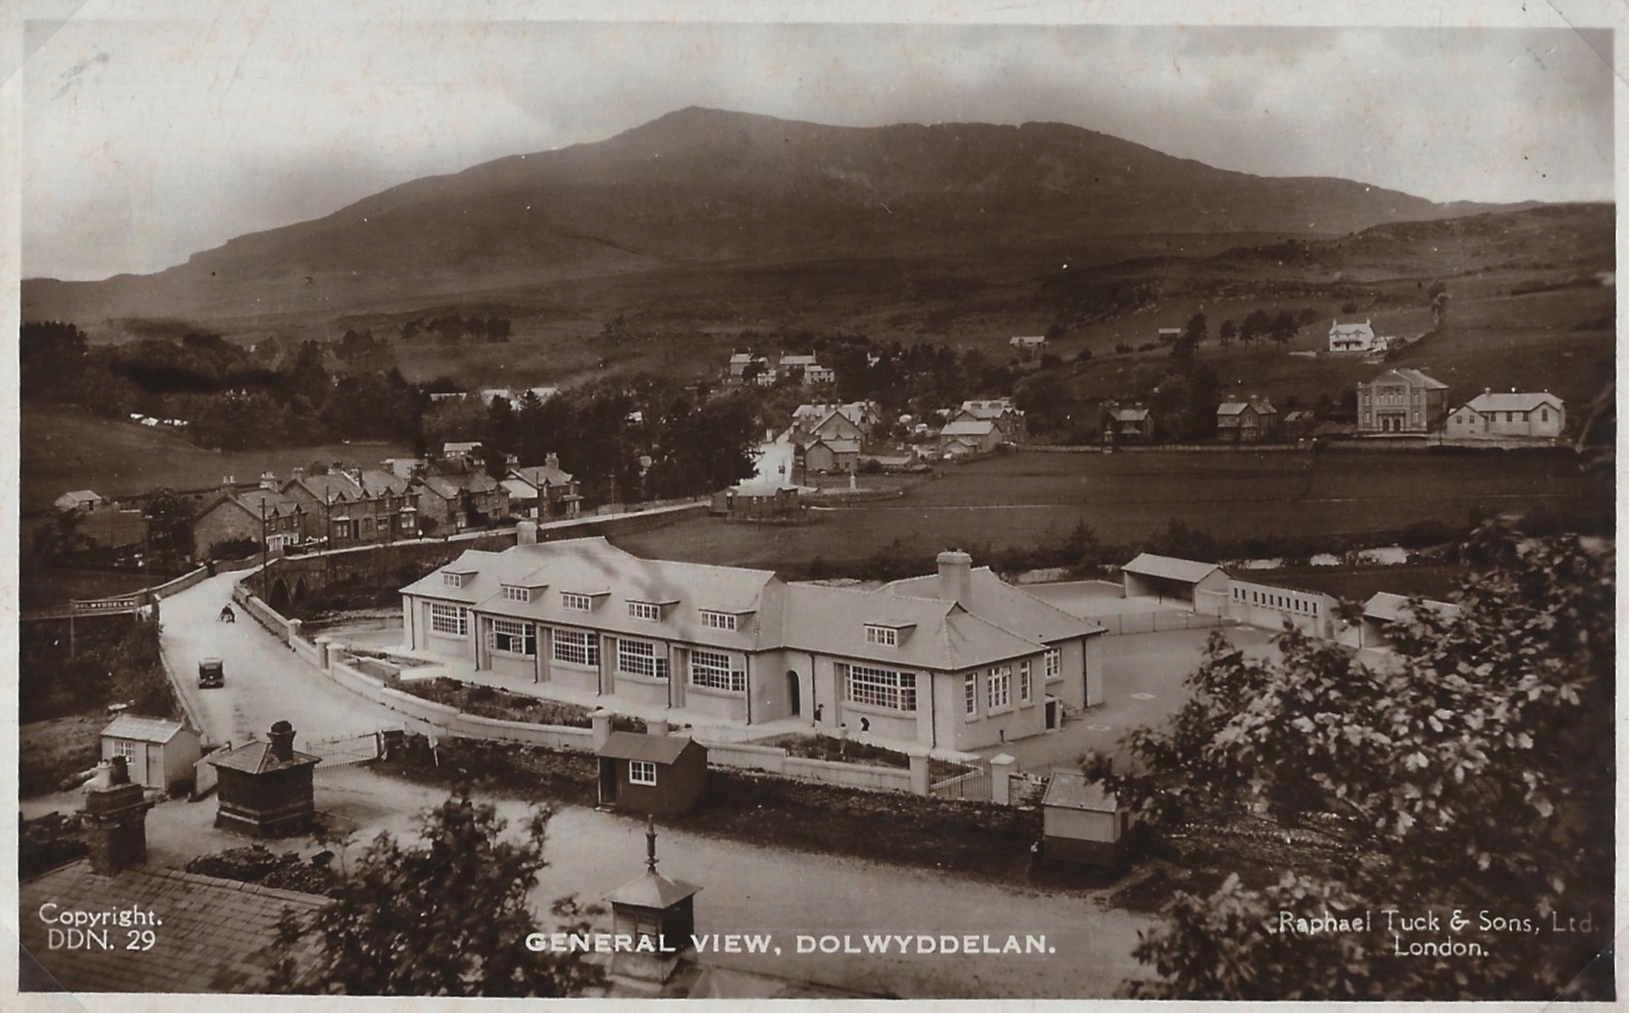 Dolwyddelan Primary School